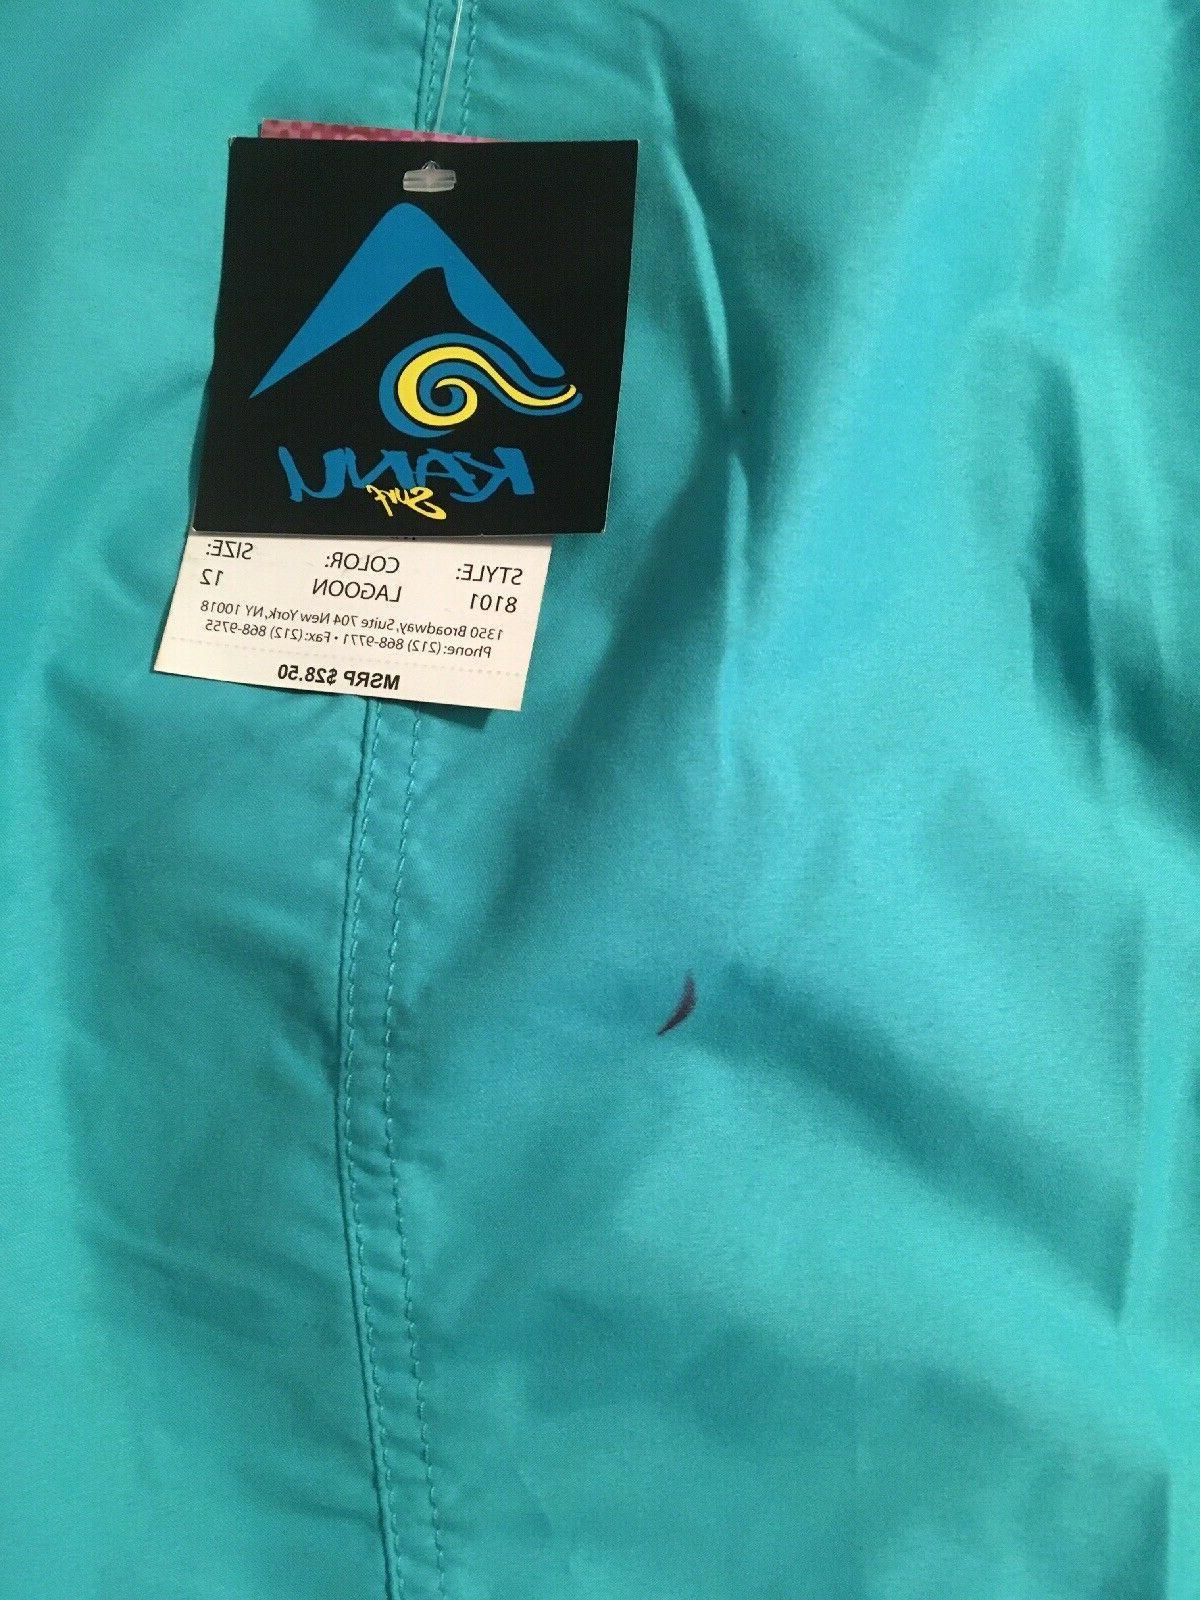 Kanu Surf Womens Board Shorts 8101 Lagoon, Slate Black